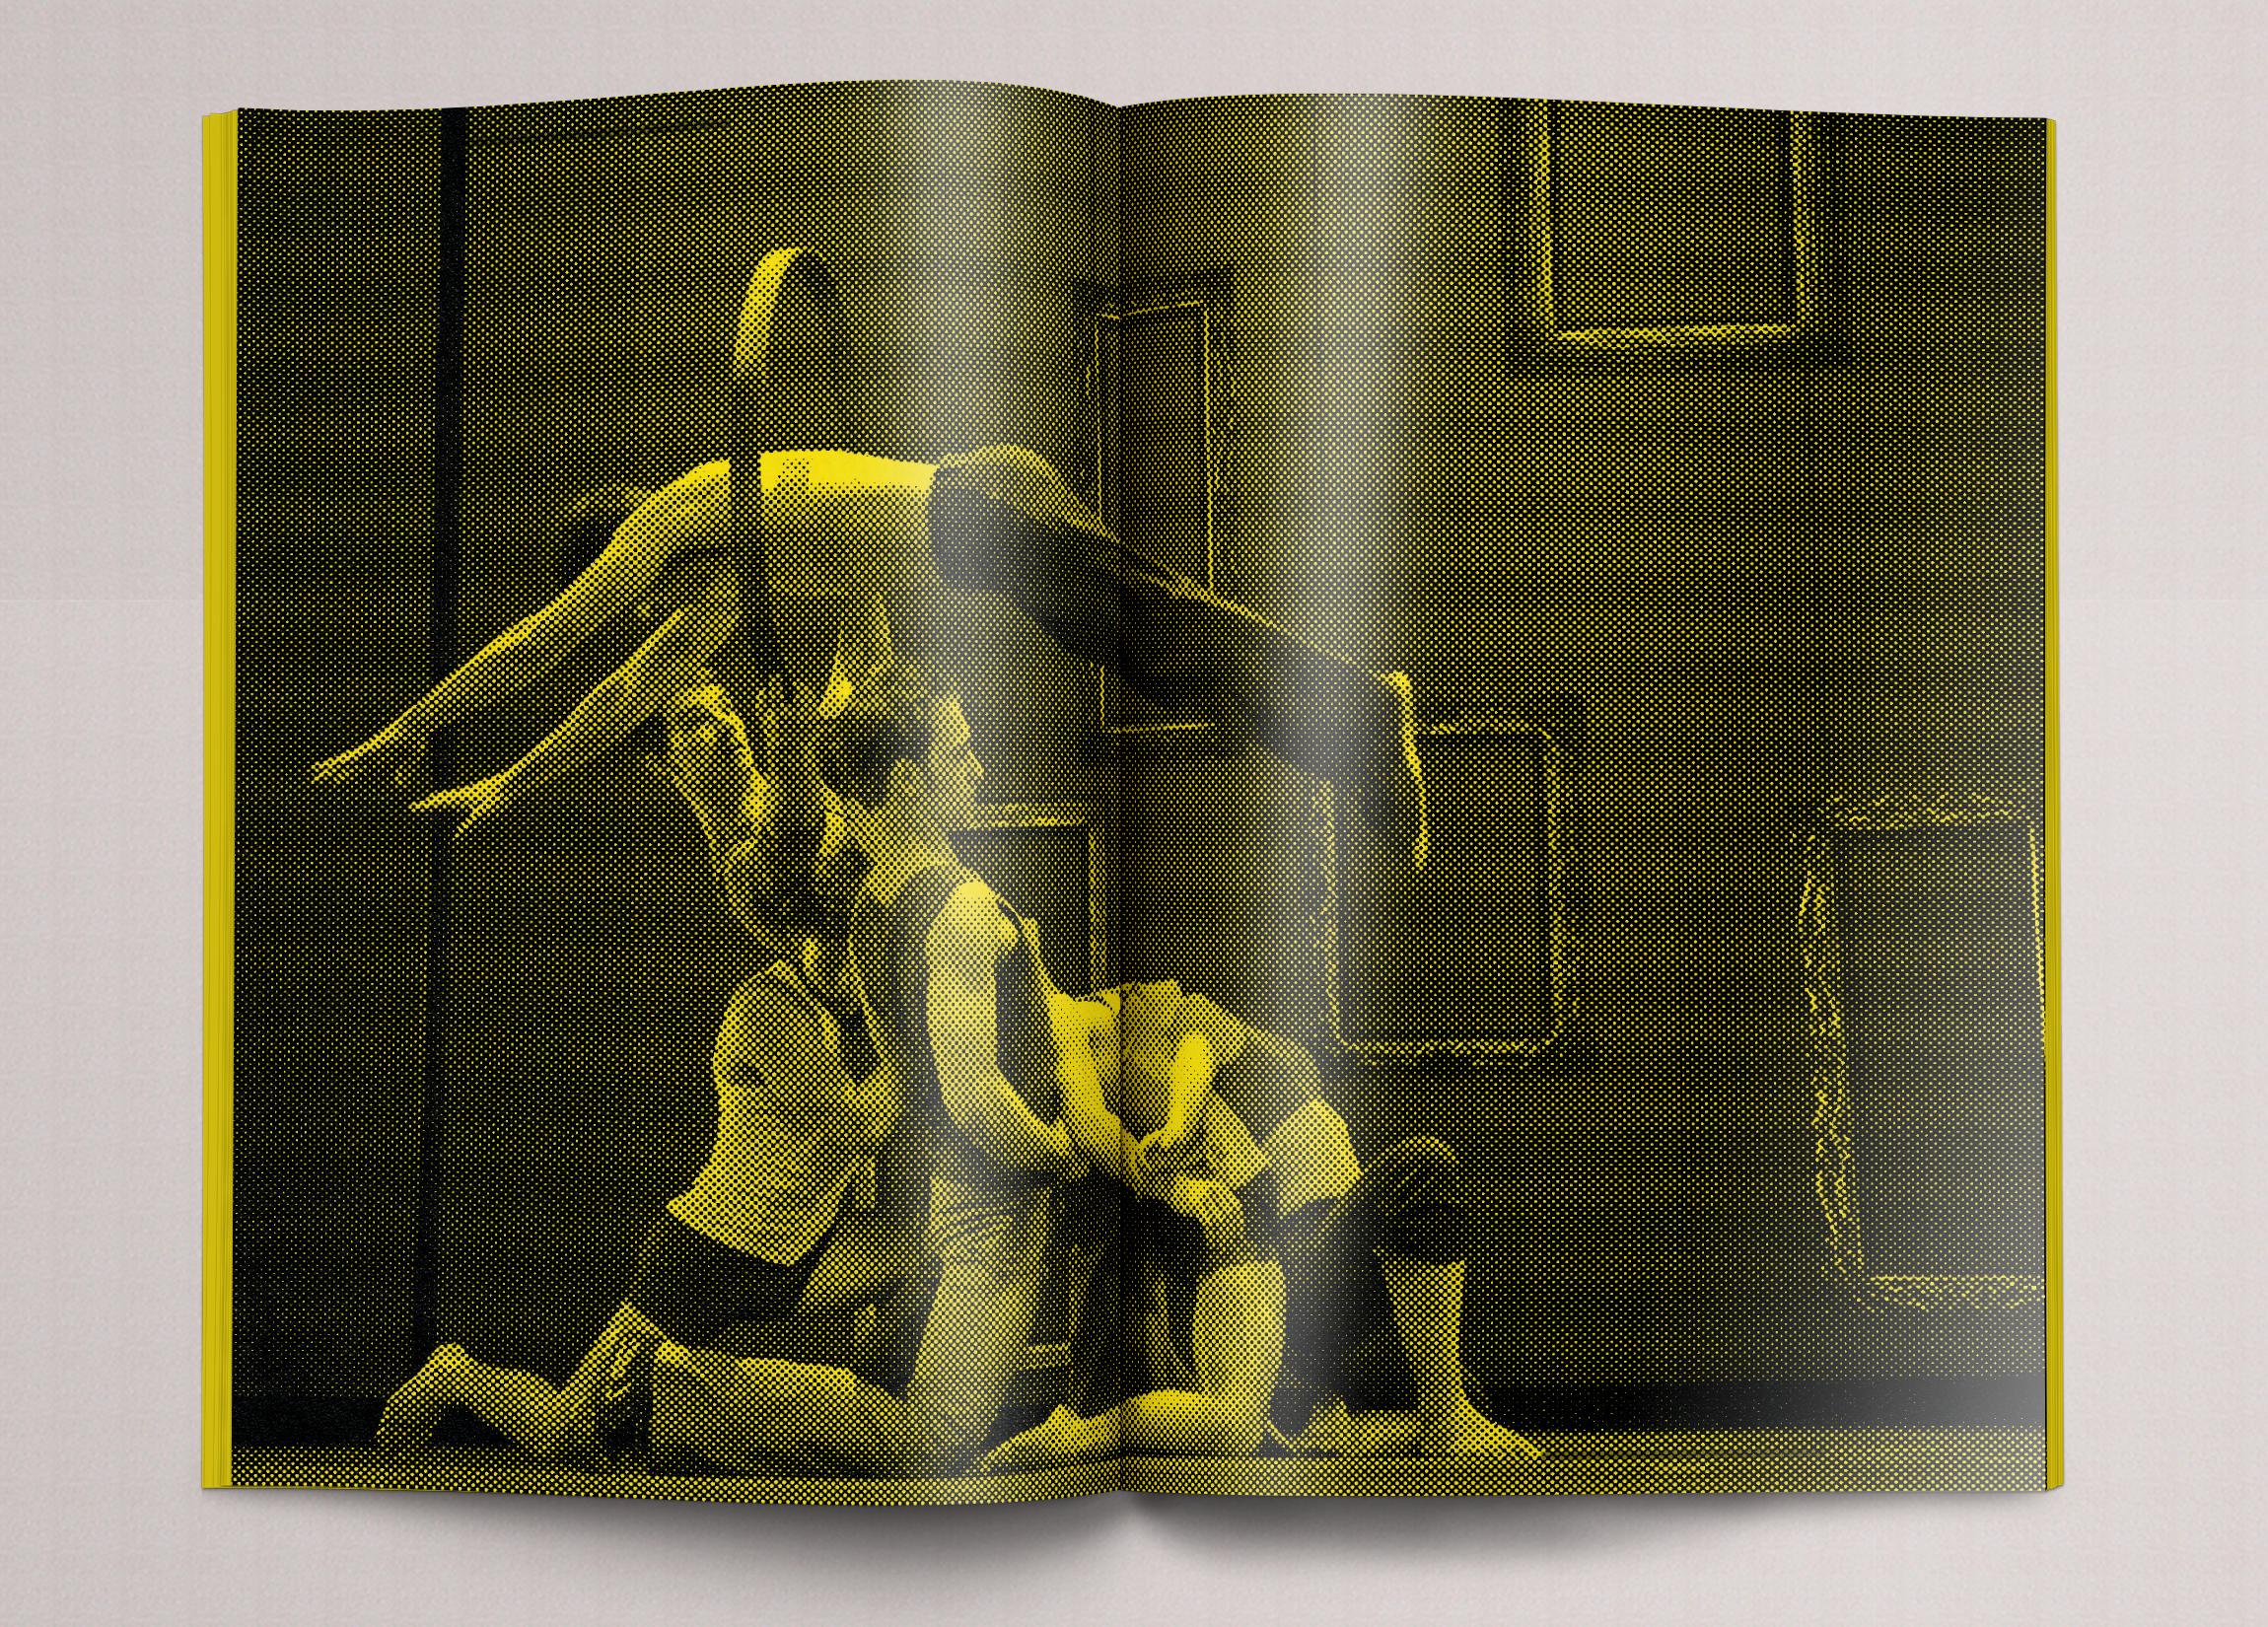 Philly Fringe_Photorealistic Magazine_spread2.jpg